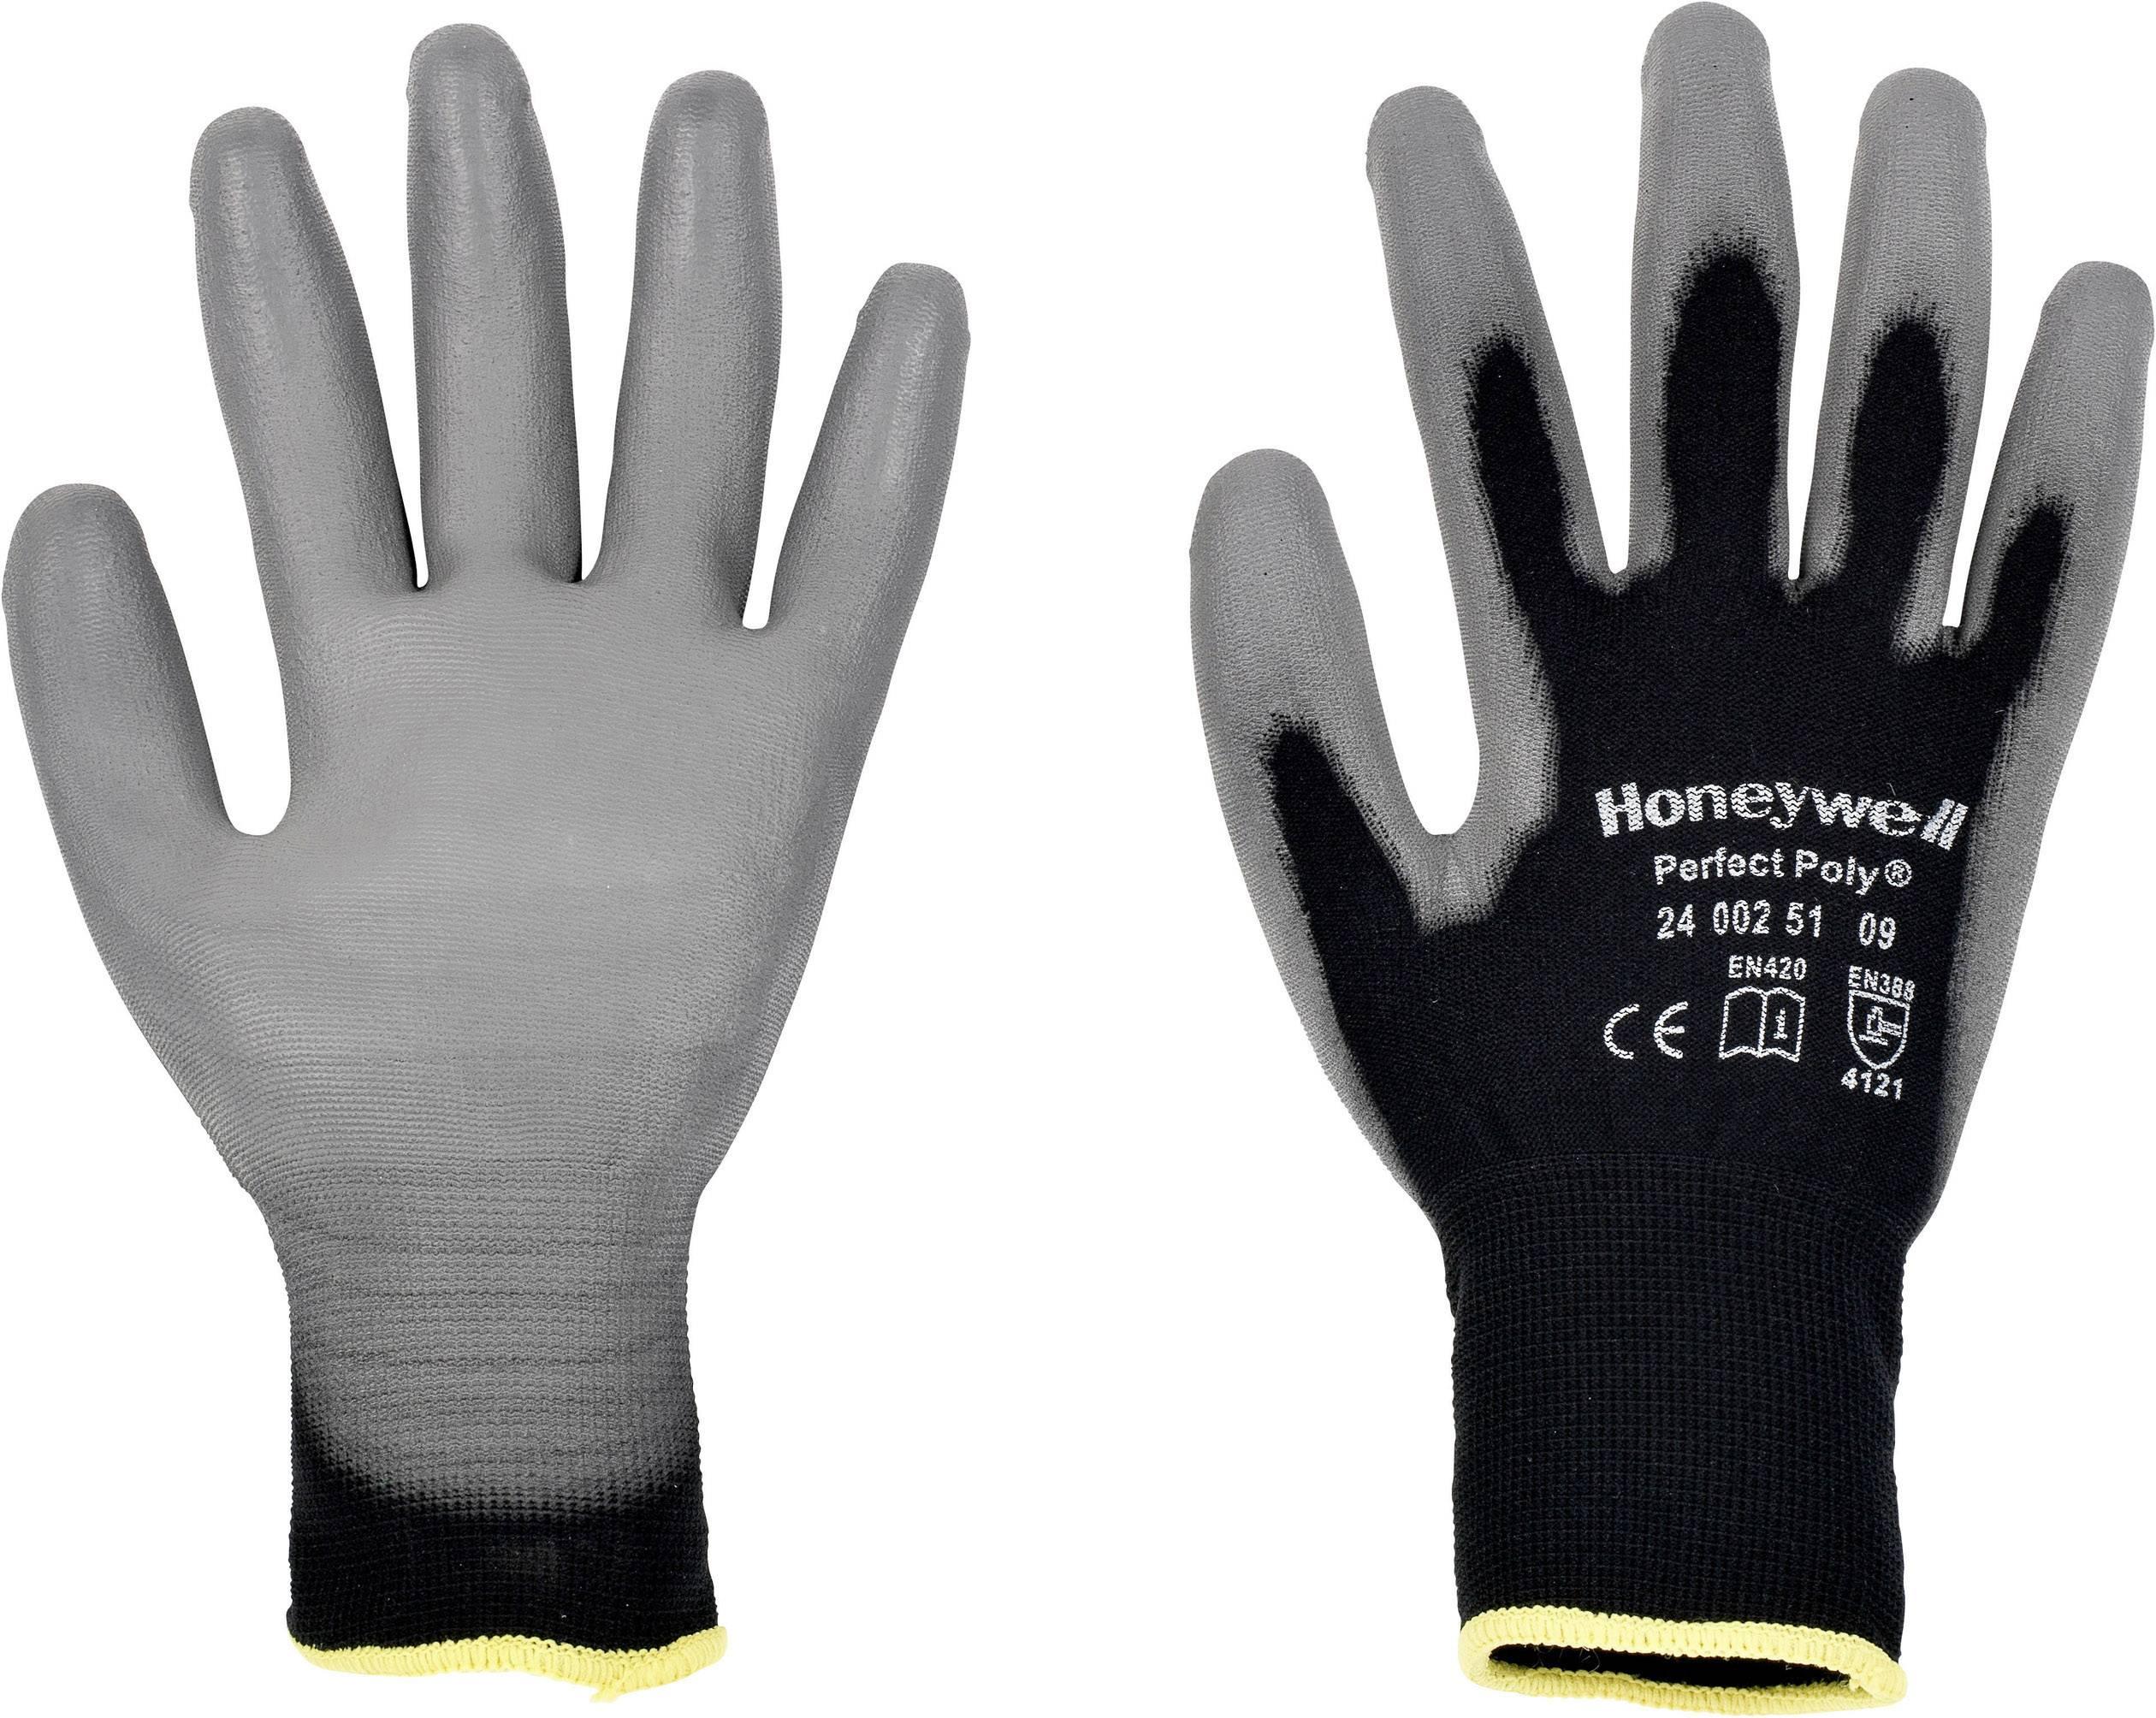 Pracovné rukavice Perfect Fit GANTS NOIRS PERFECTPOLY 2400251, velikost rukavic: 6, XS